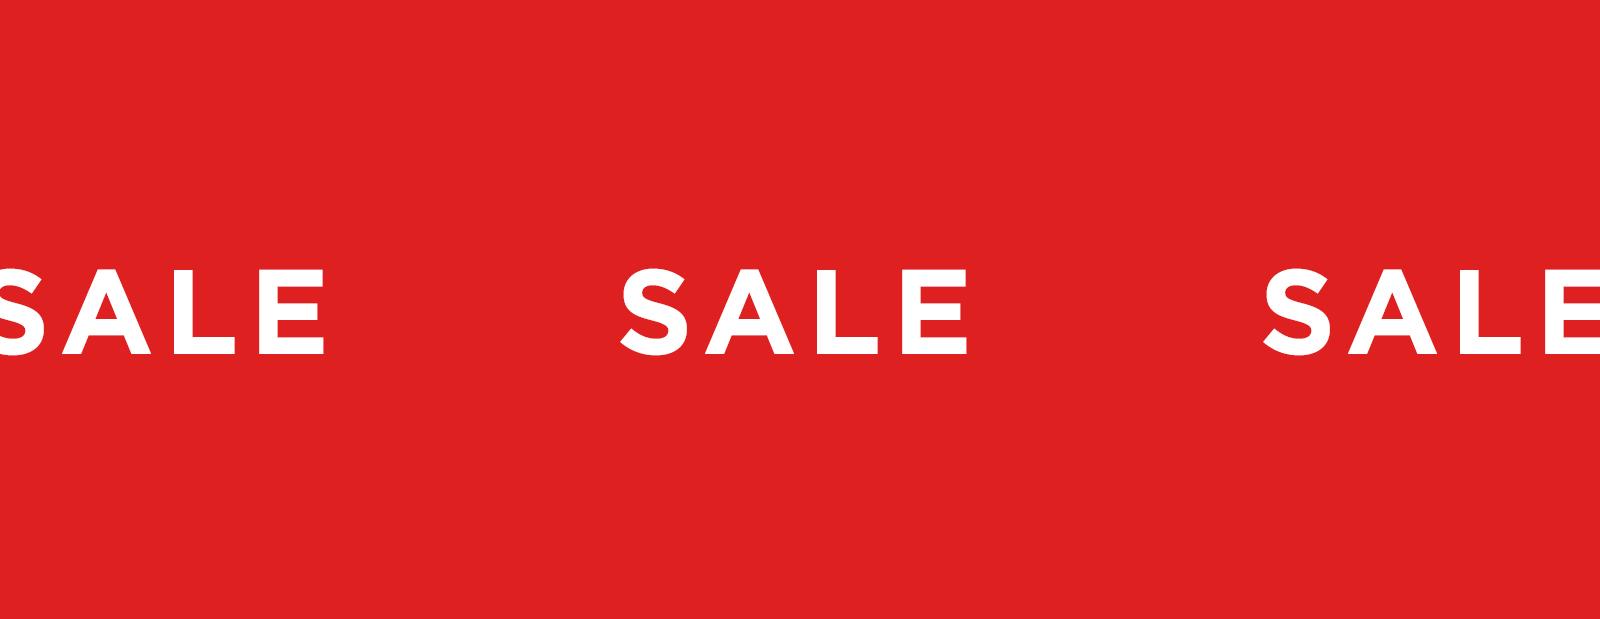 17aw_sale